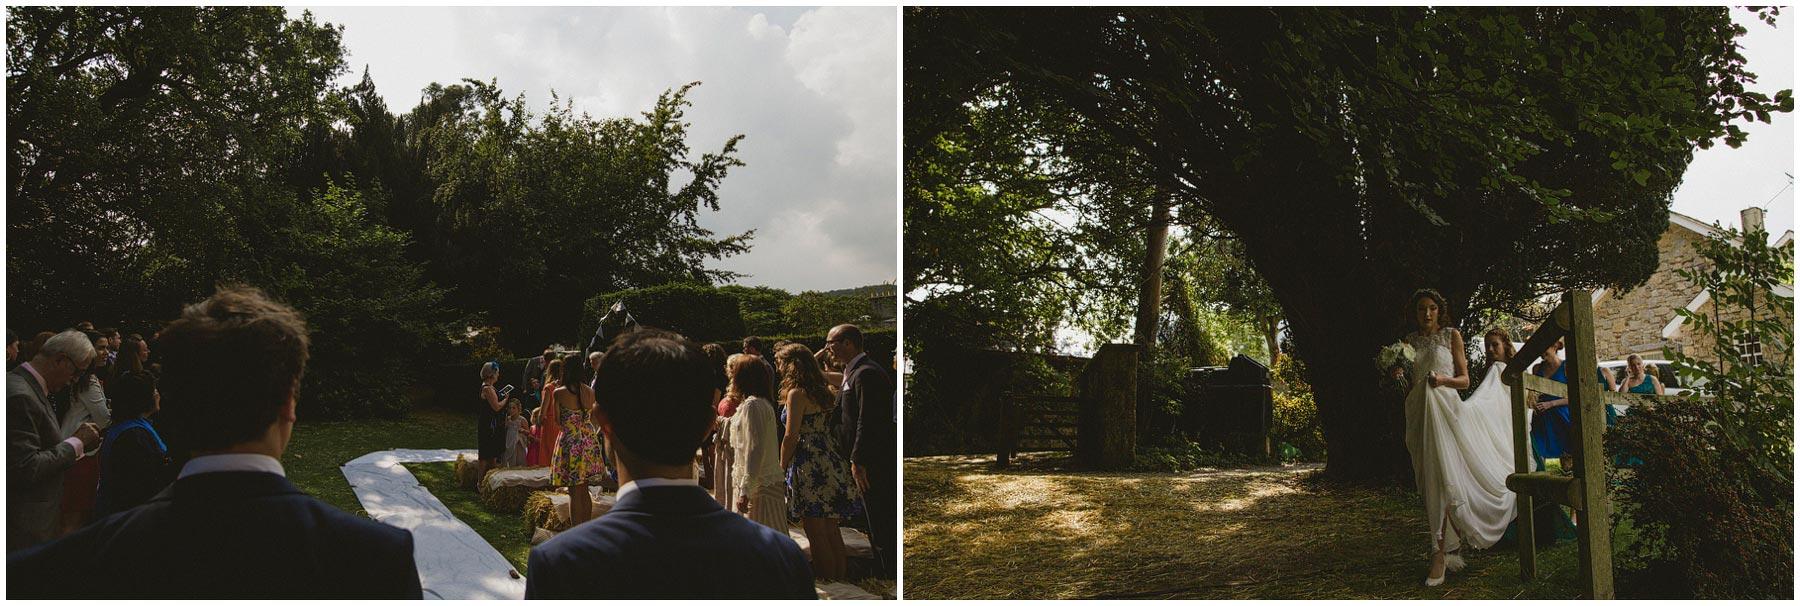 Colehayes-Park-Wedding-Photography_0063